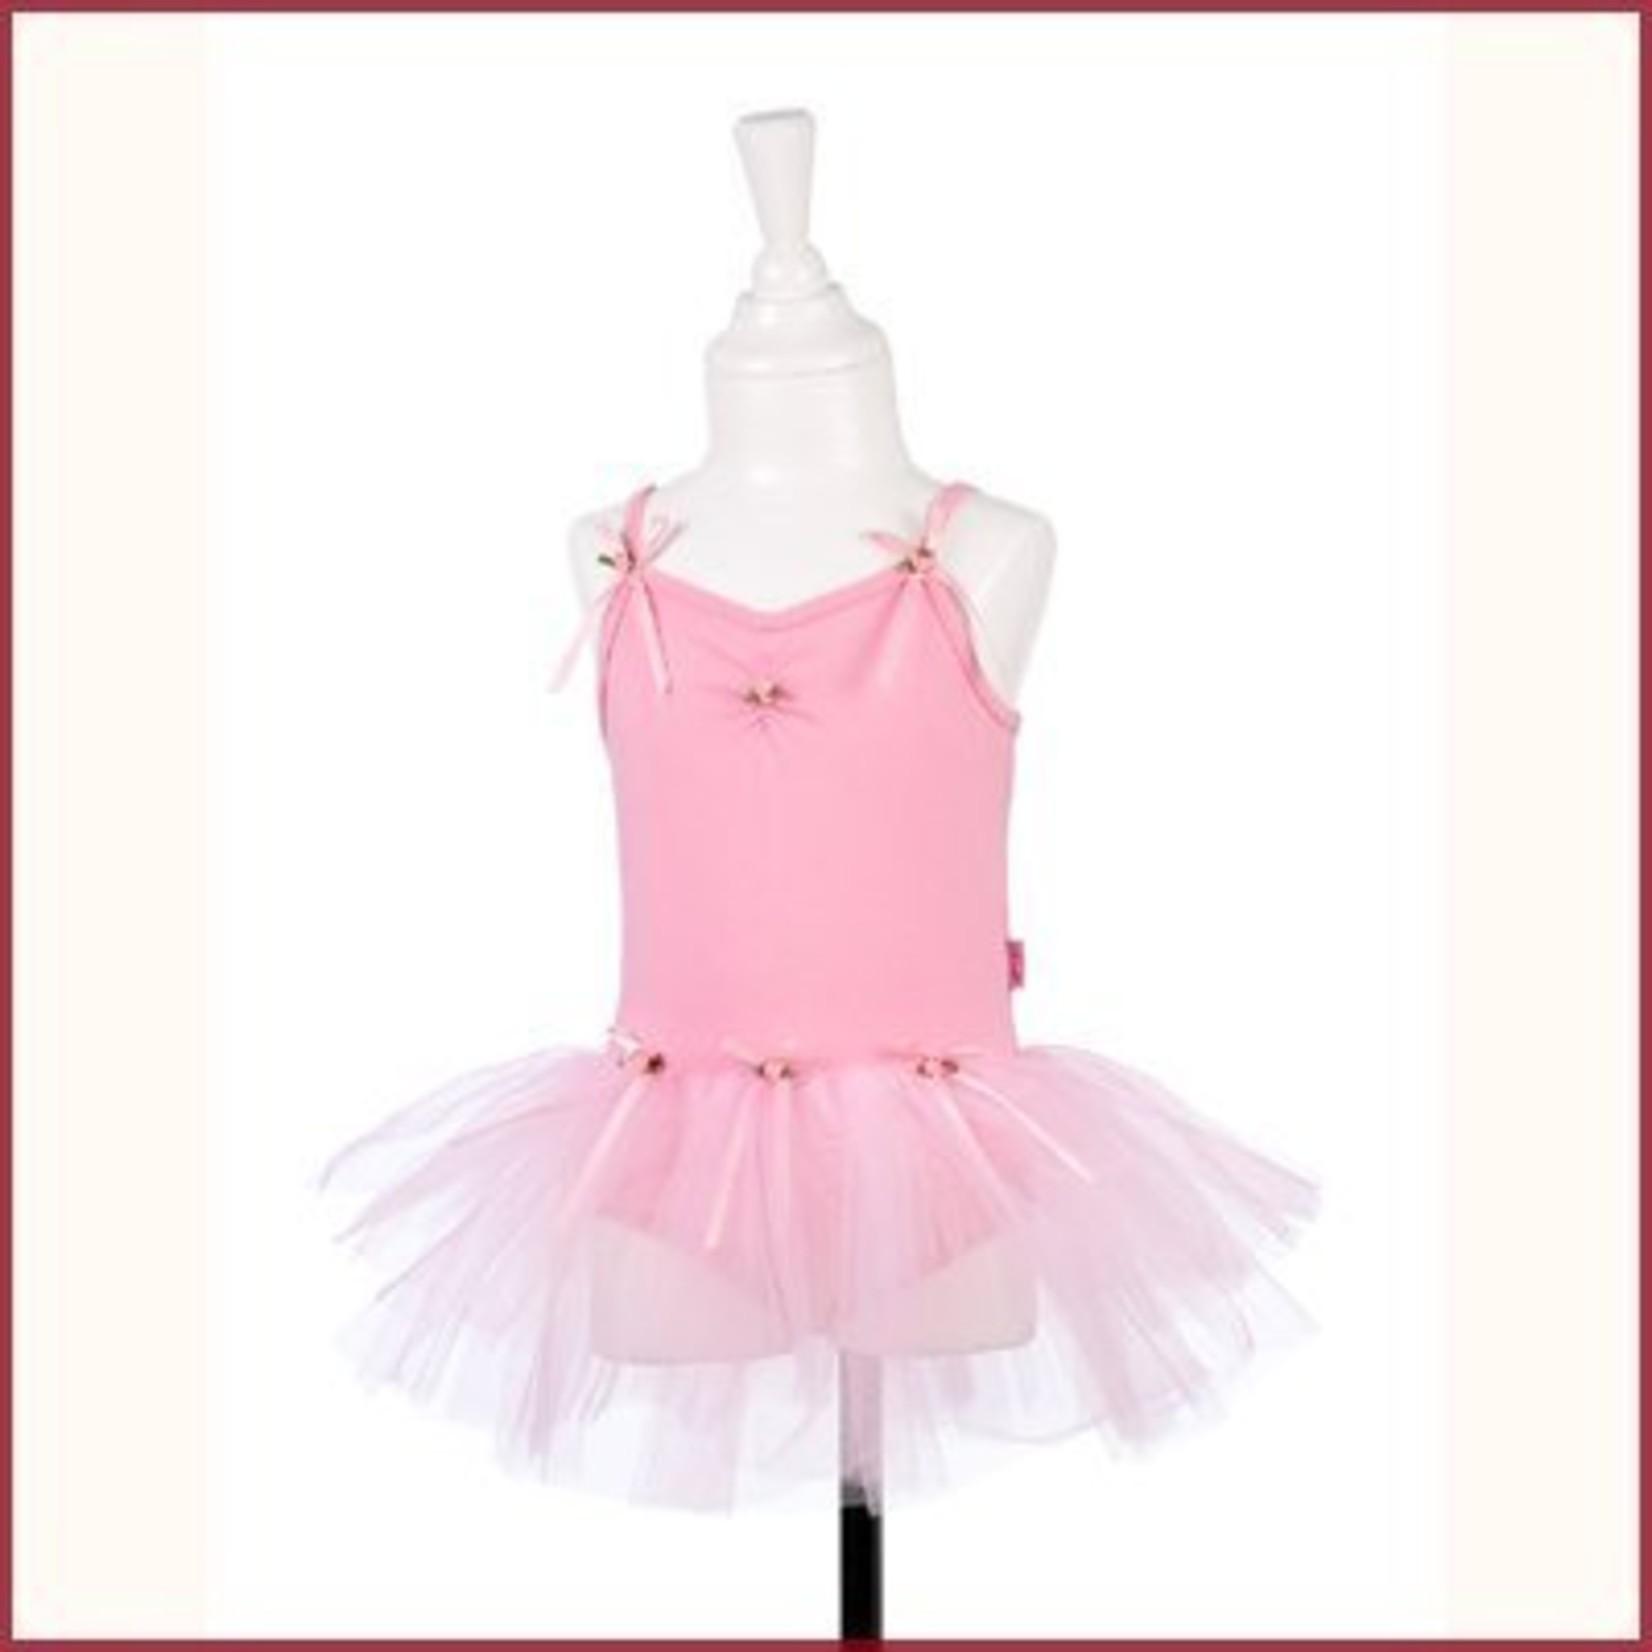 Souza for kids Balletpakje Vivianne